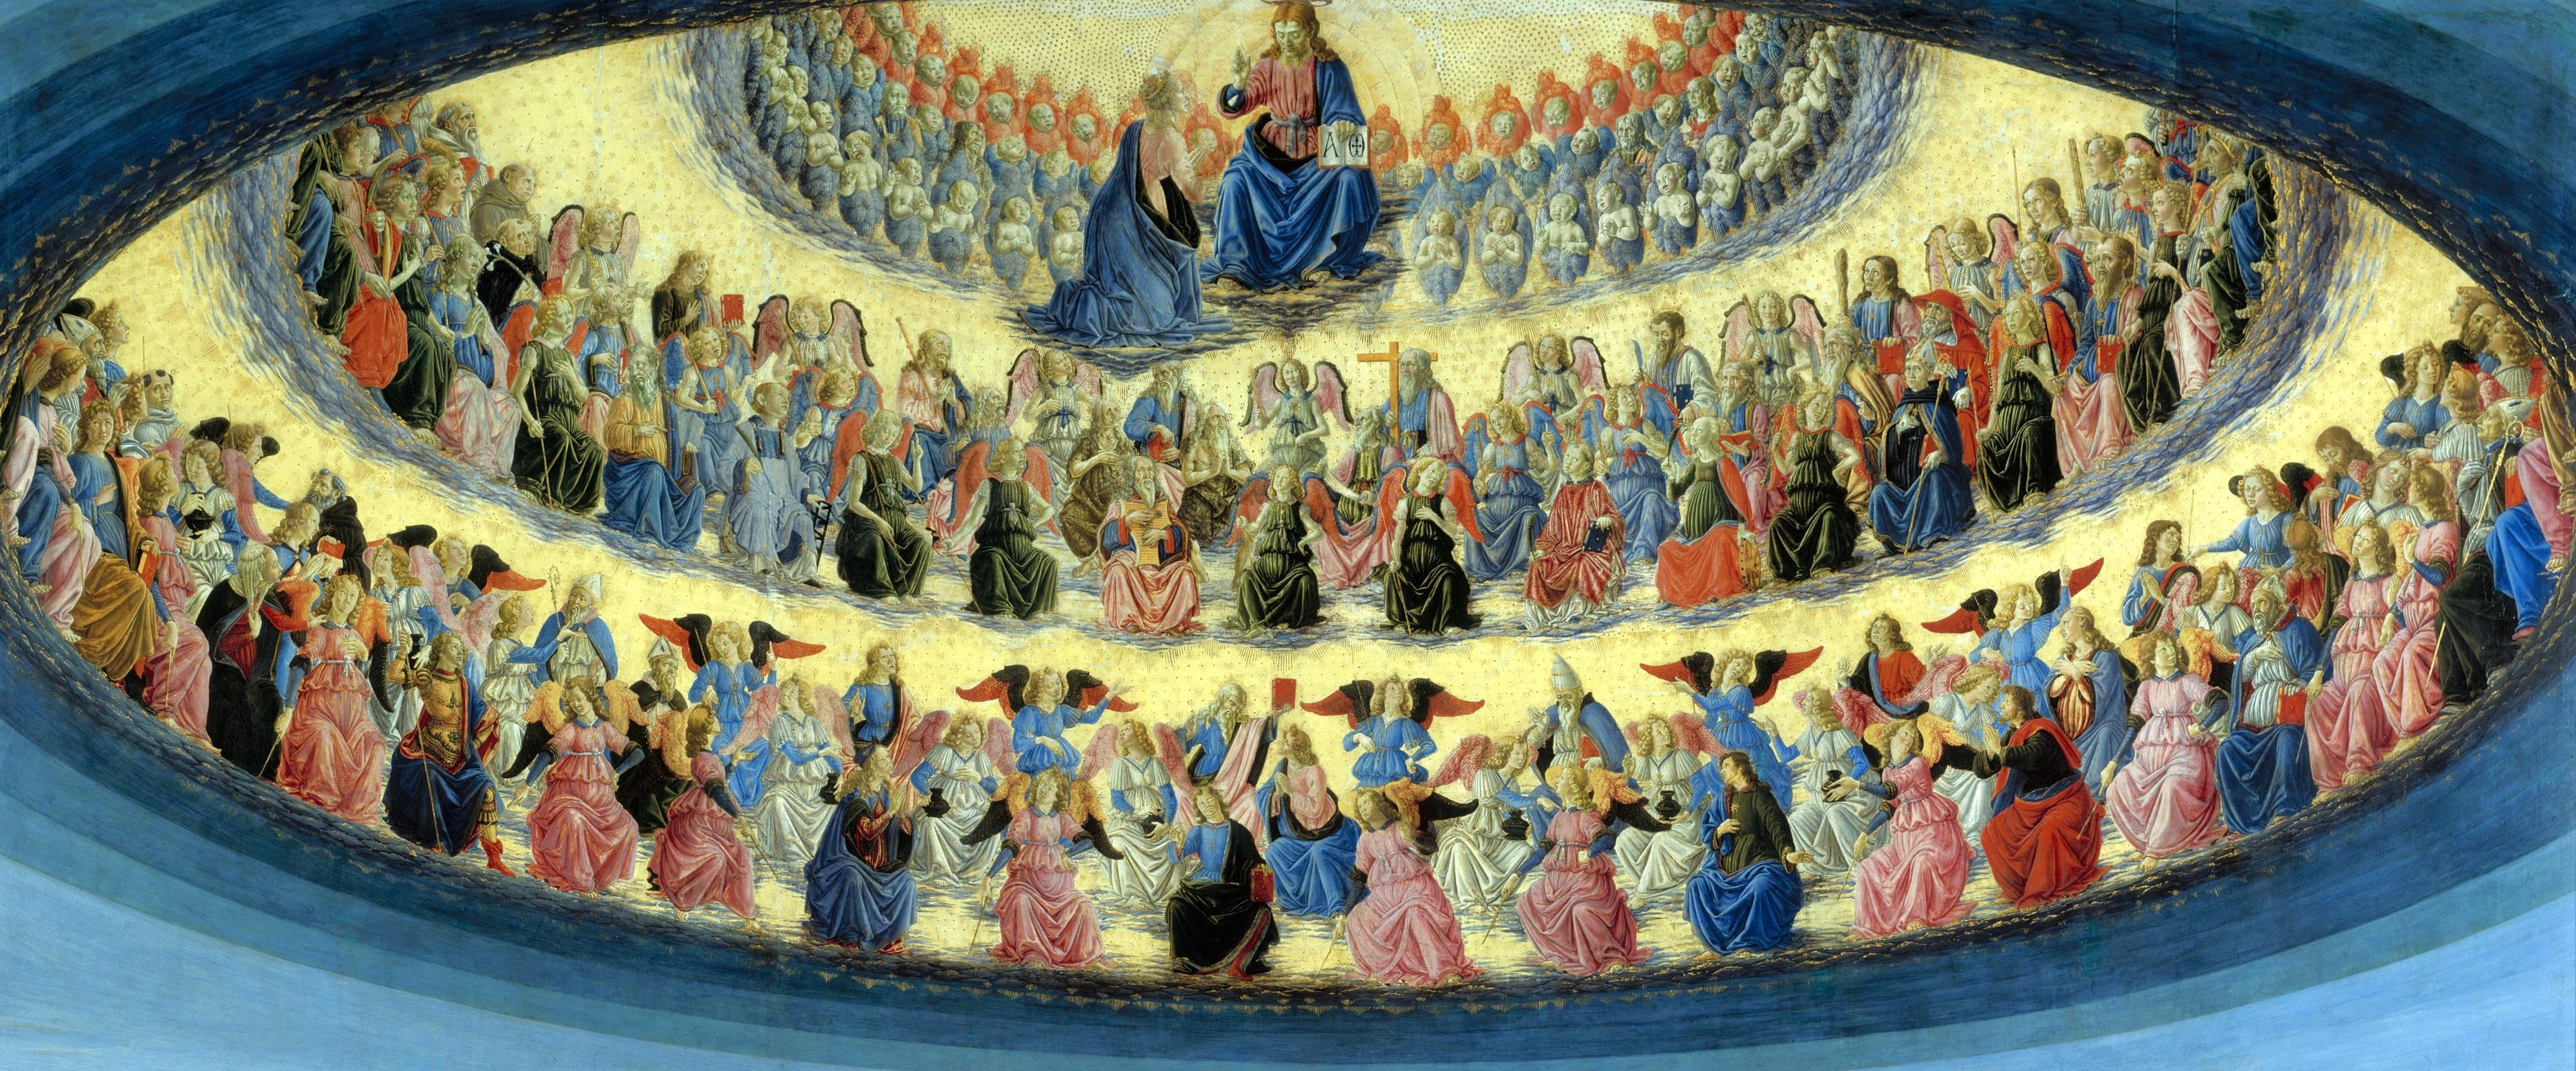 The Assumption of the Virgin, Francesco Botticini